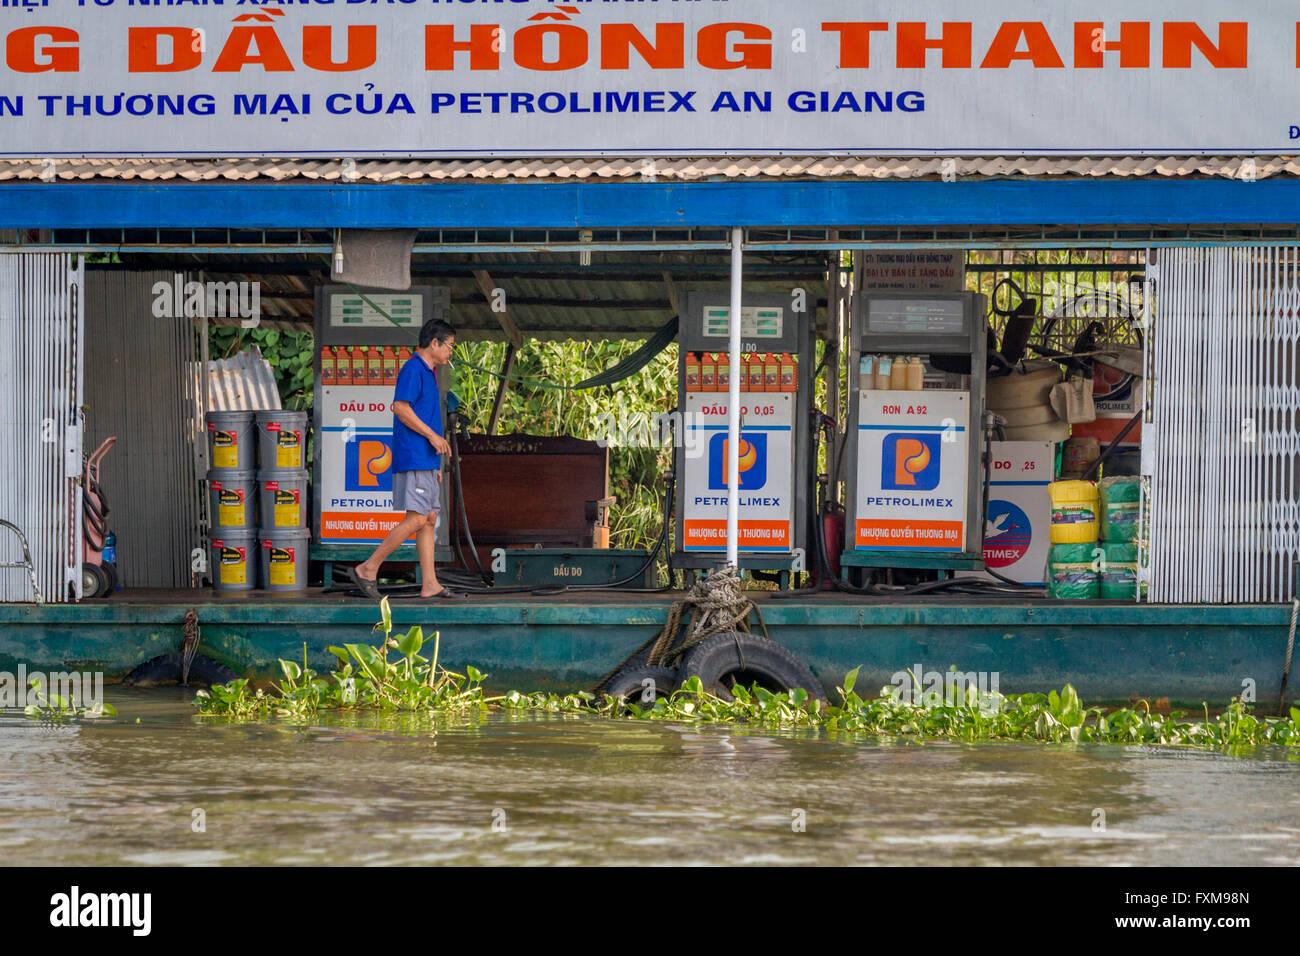 Floating petrol station, Chau Doc, Vietnam - Stock Image